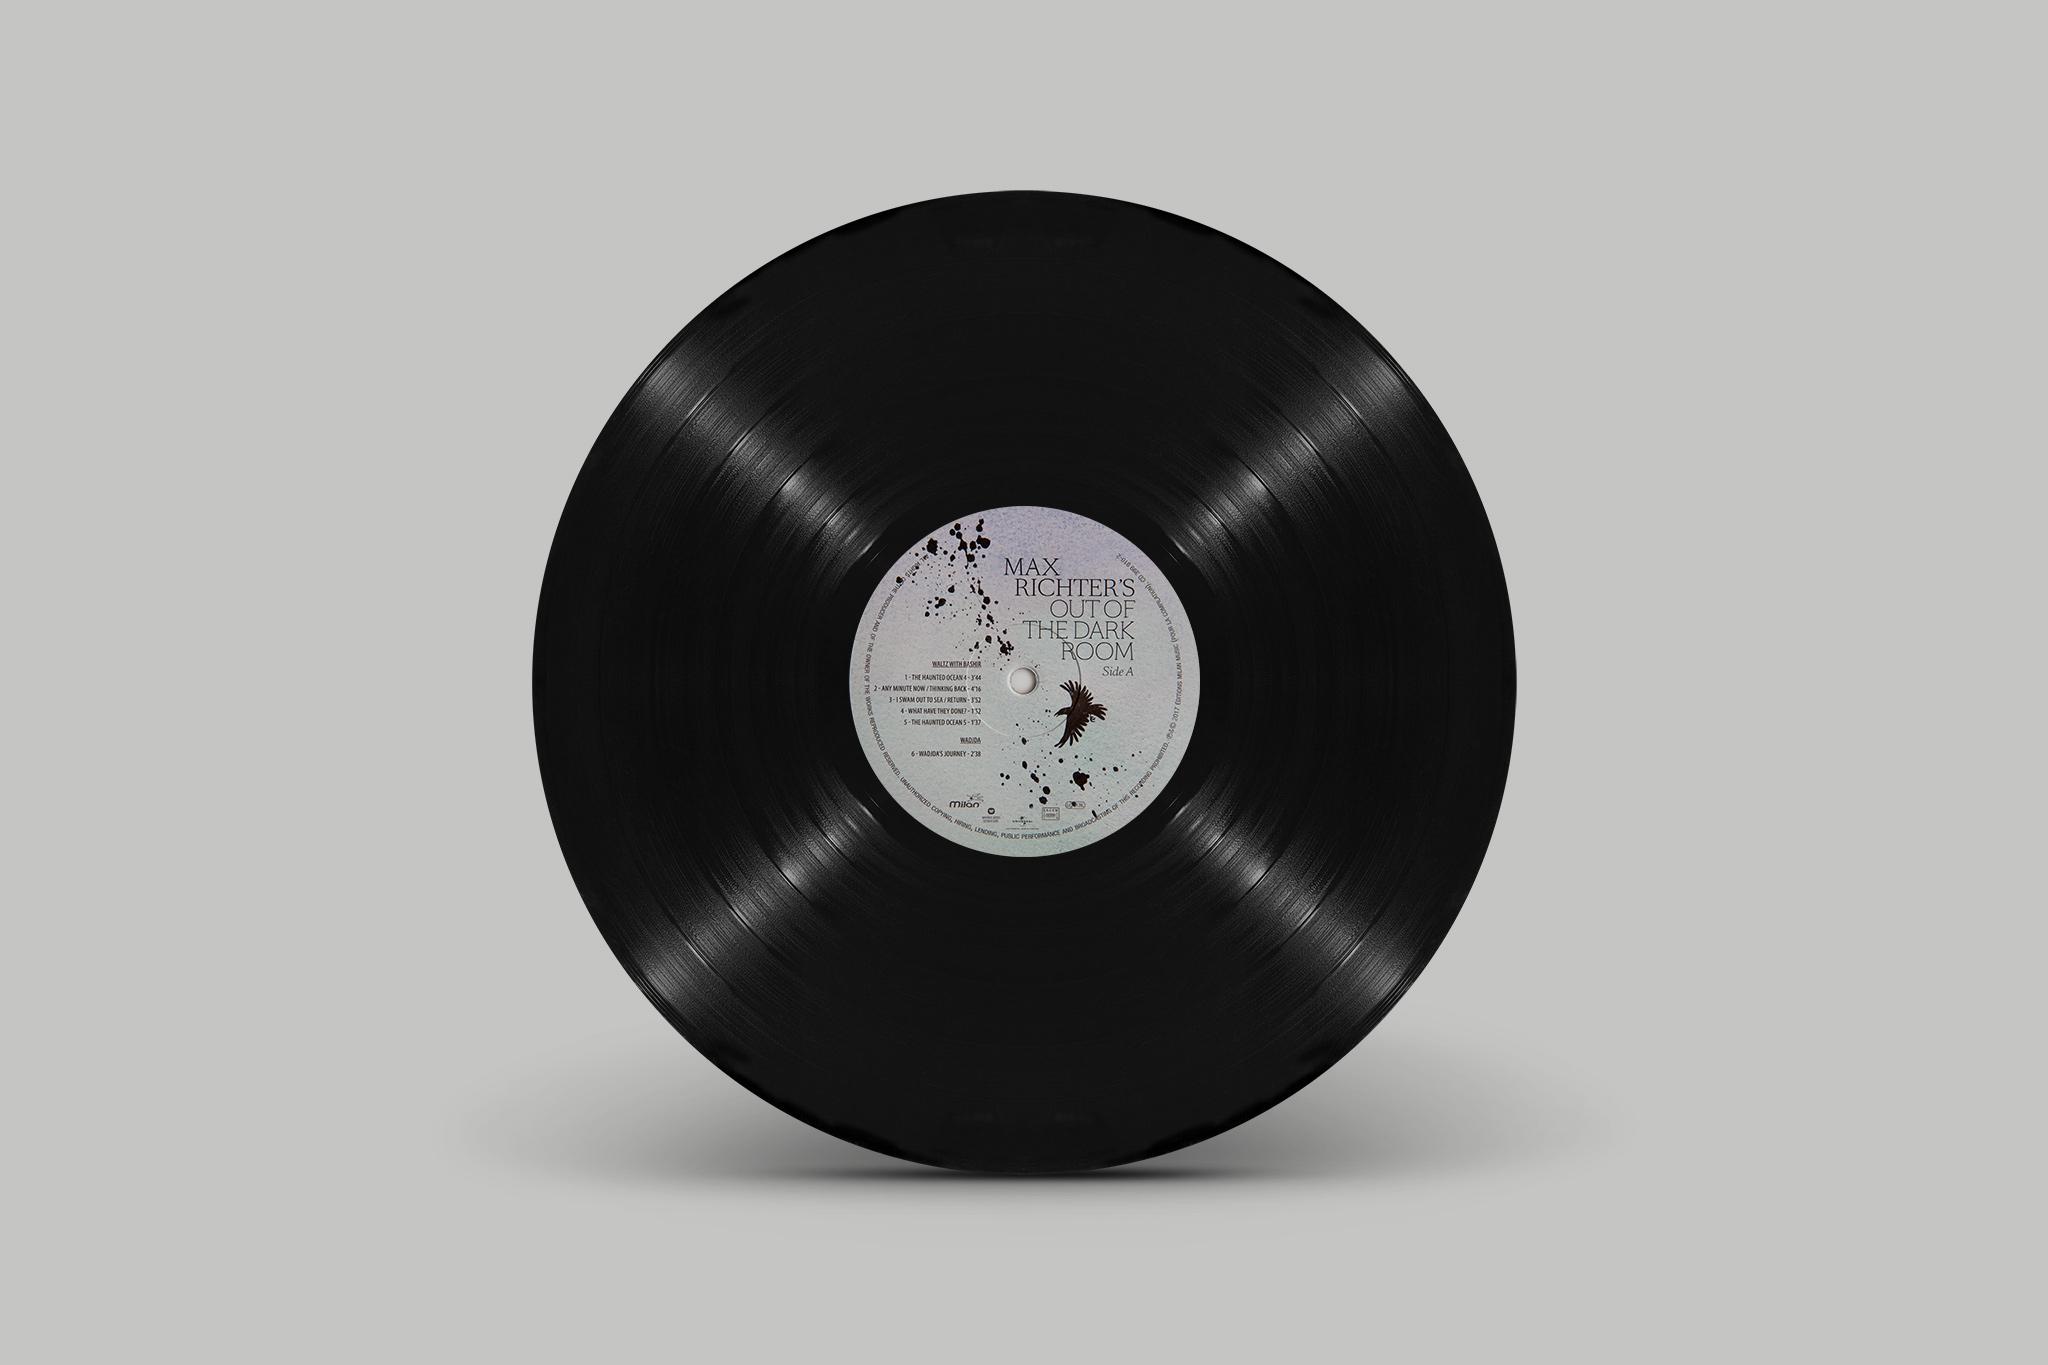 MaxRichter_Vinyl_web_1.jpg